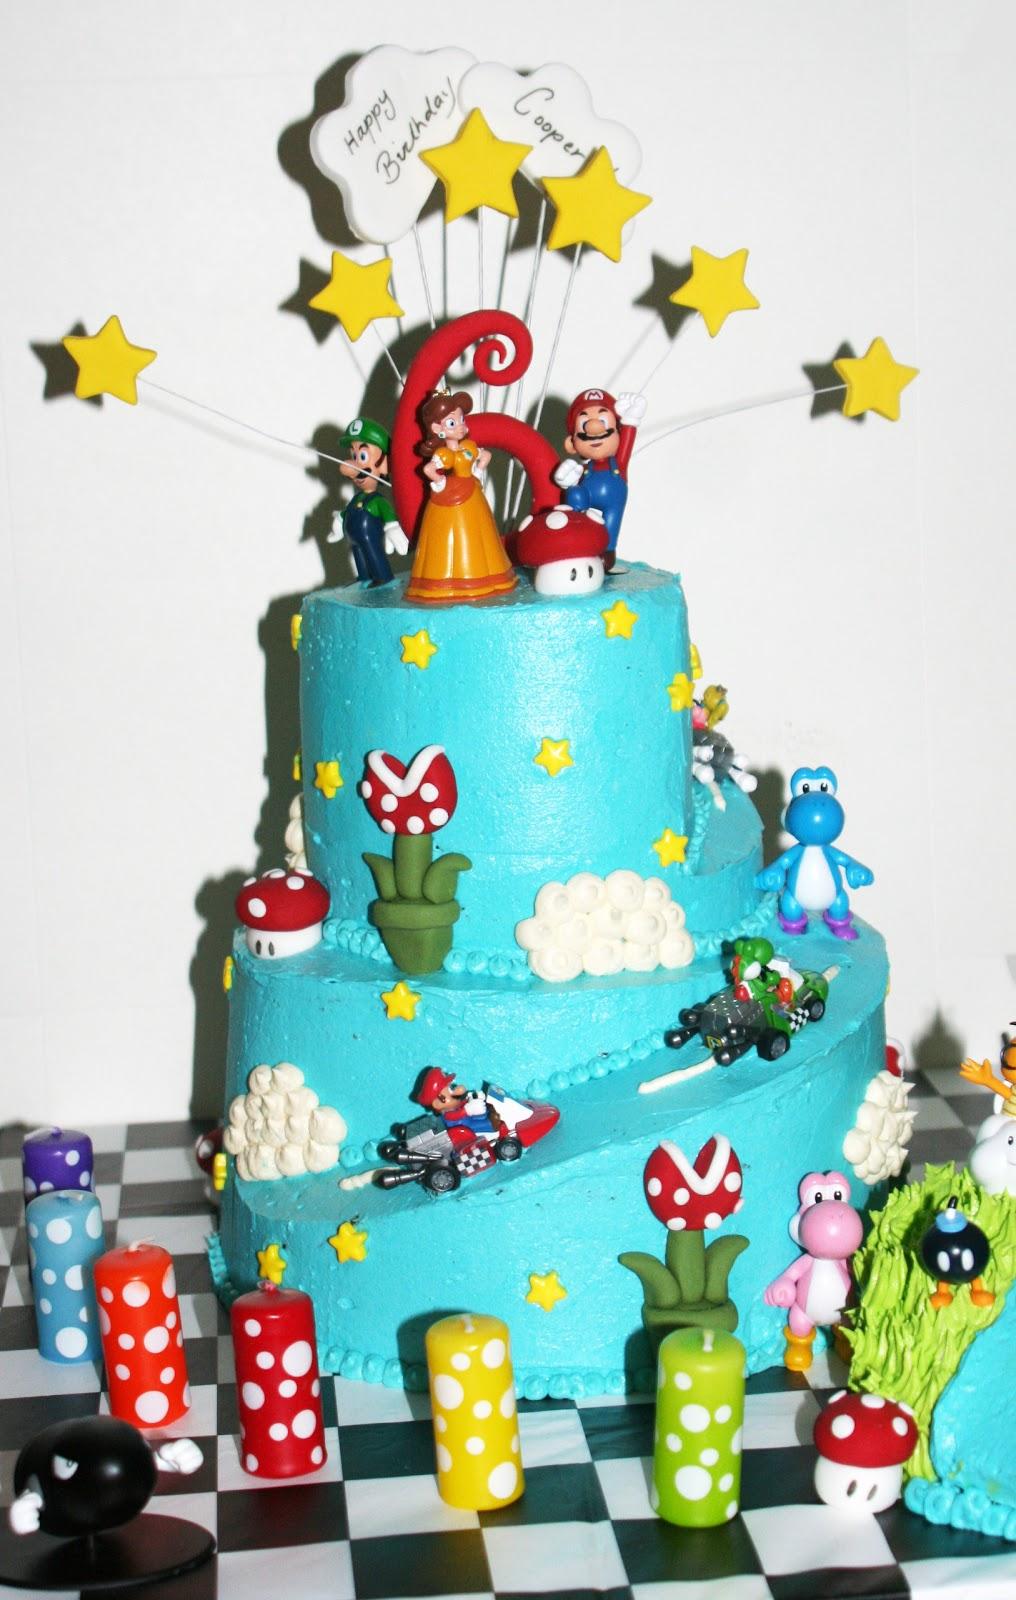 CRAVINGS cakes cupcakes and cookies: Super Mario Bros Cake